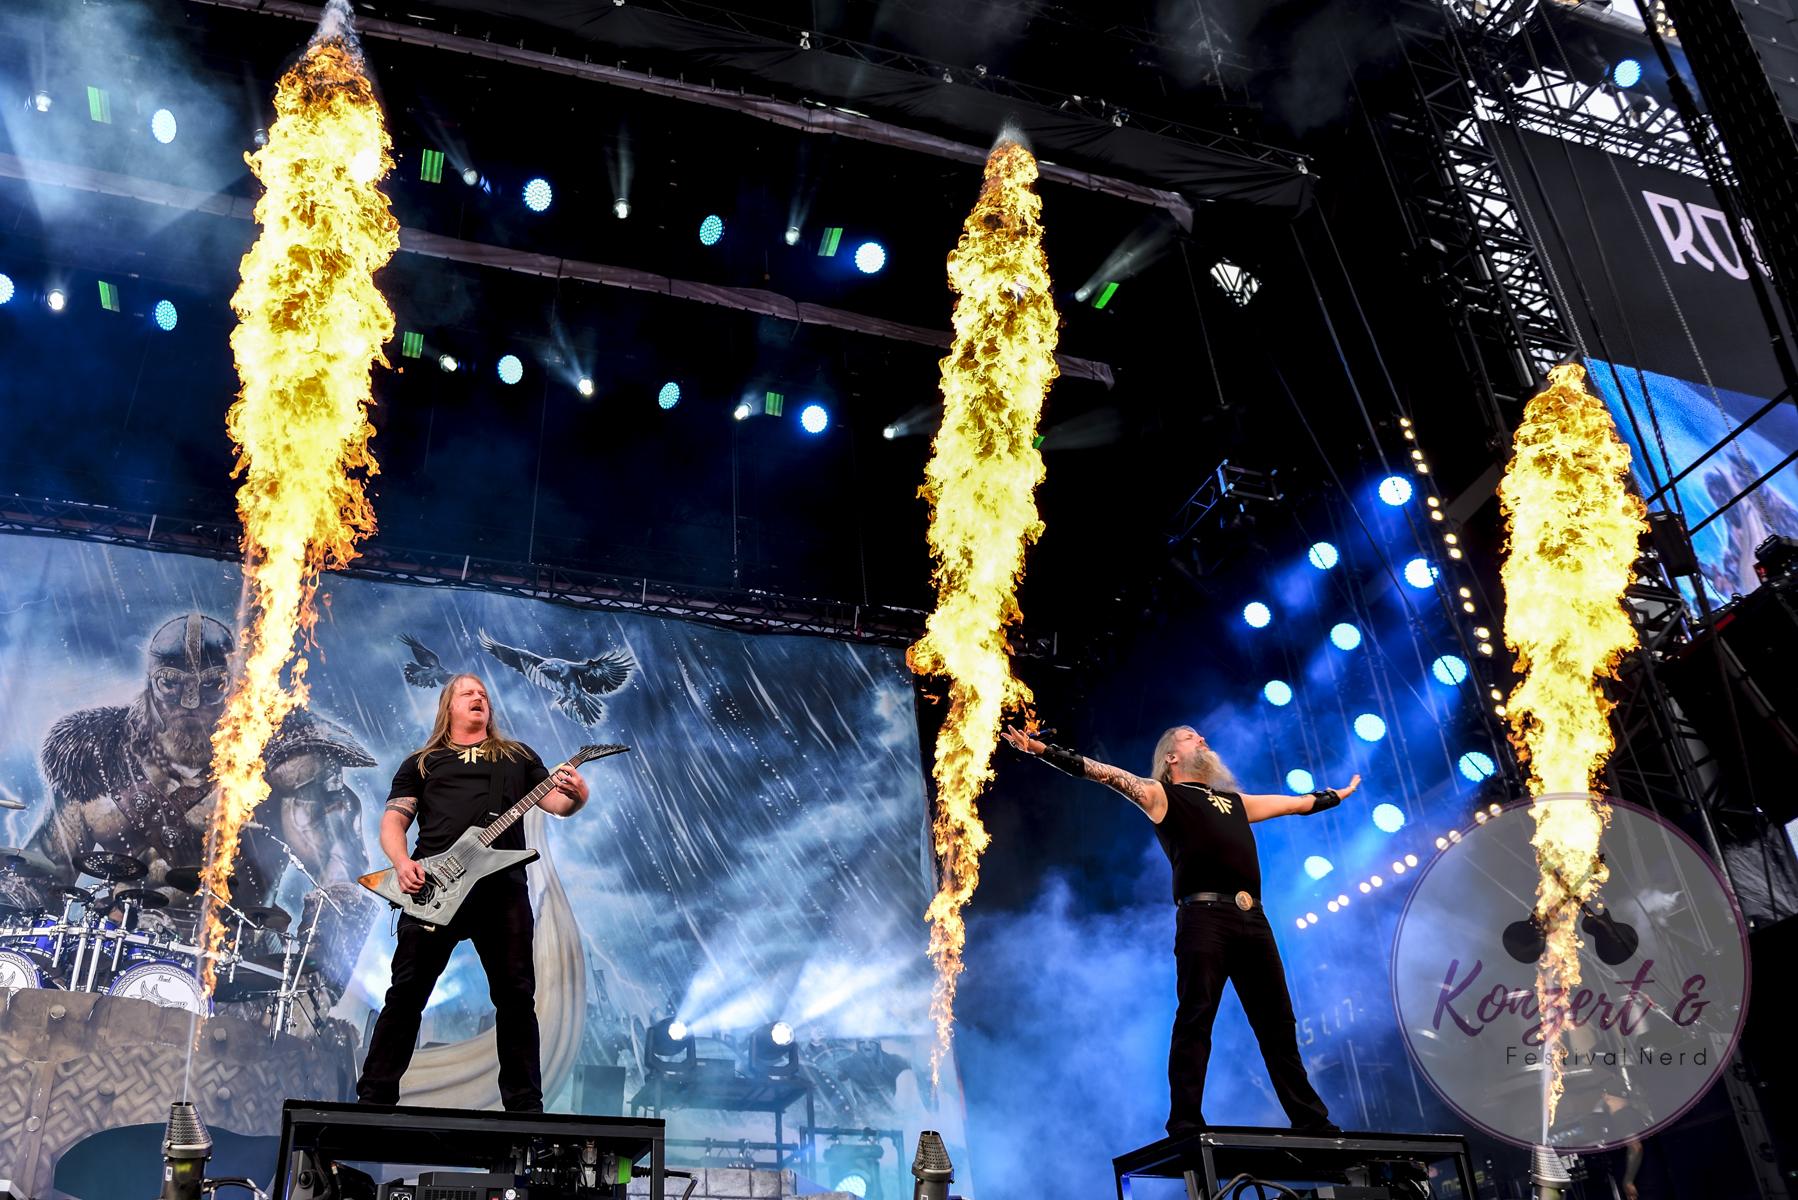 Amon Amarth am 3. Tag von Rock am Ring 2019 | 09.06.2019